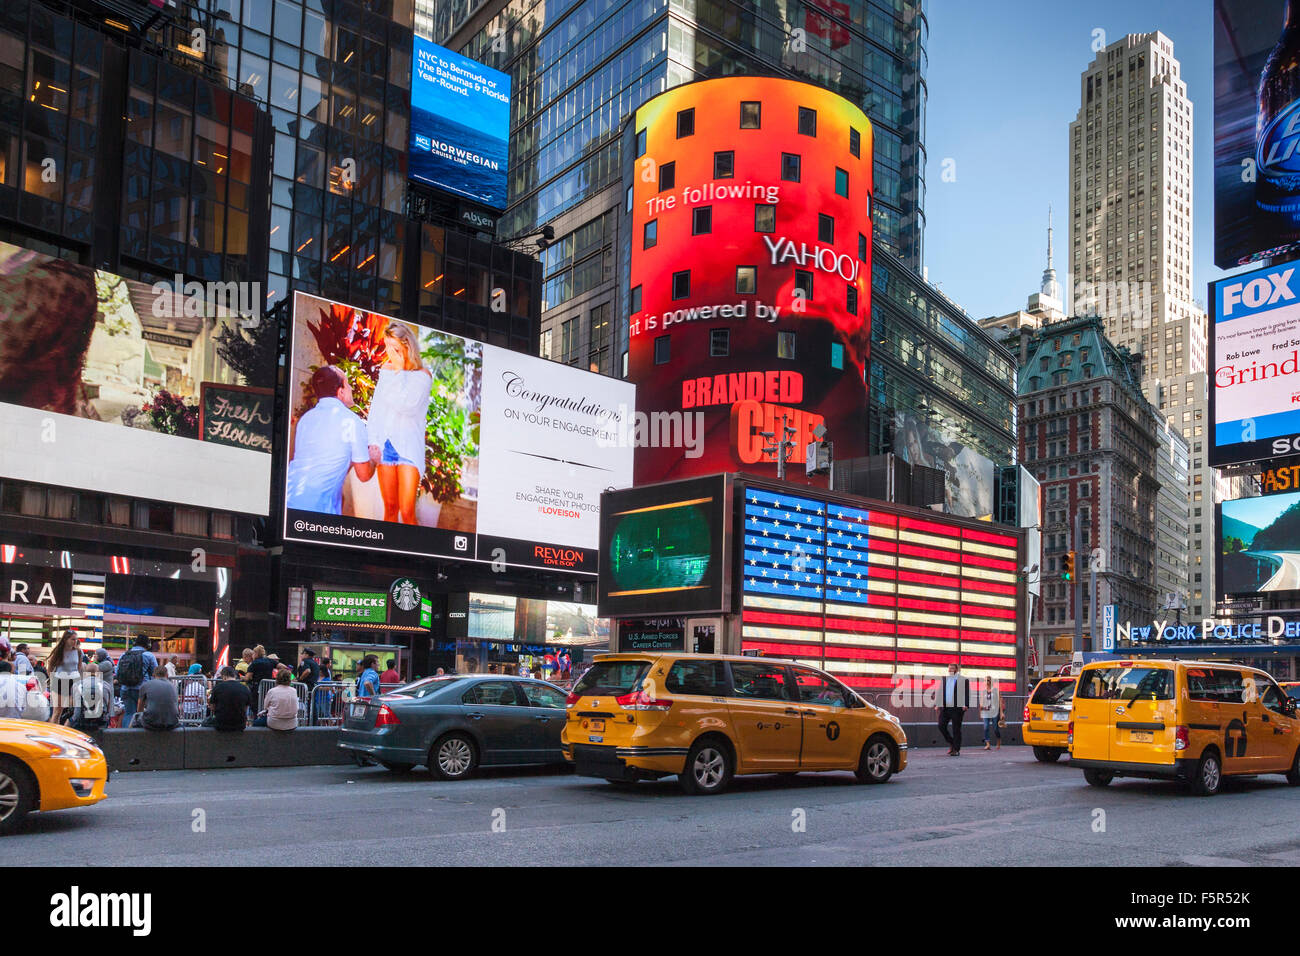 Times Square, midtown Manhattan, New York, USA Stock Photo